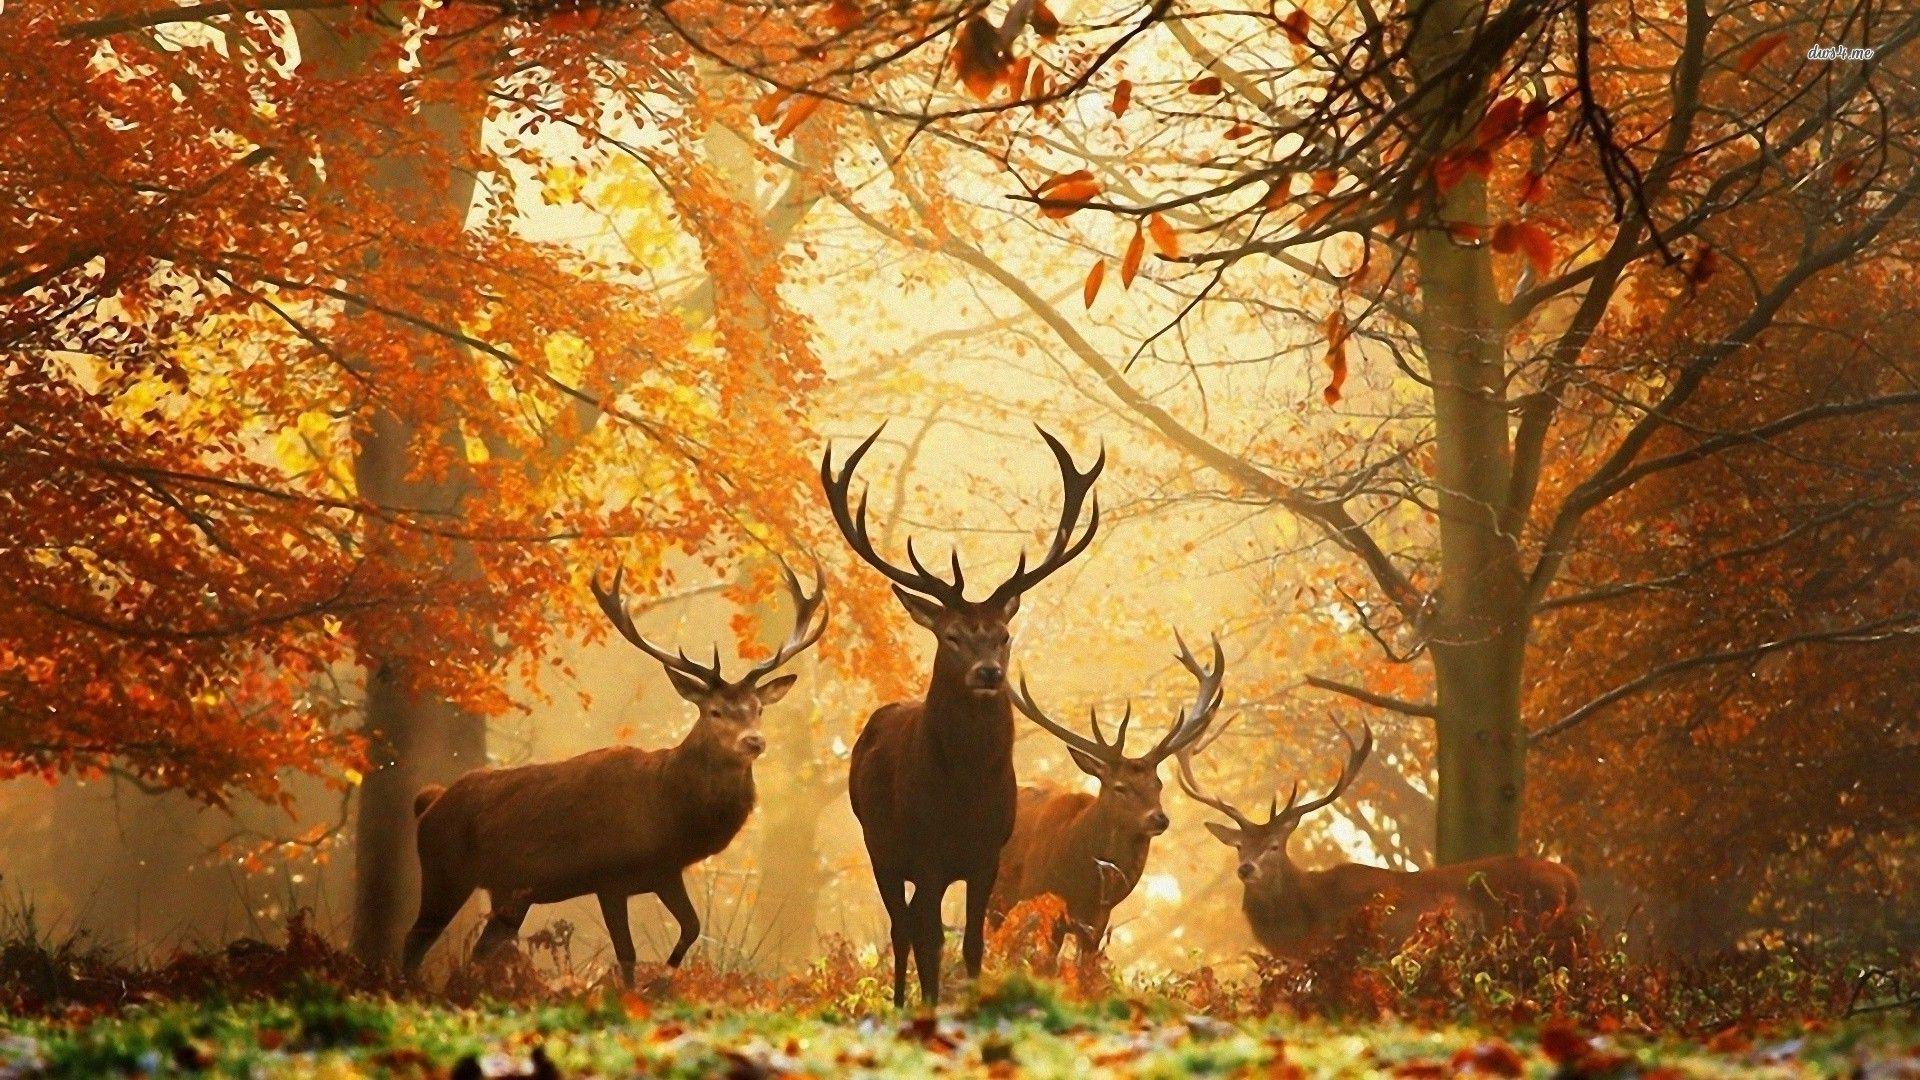 Deer HD wallpaper Animal wallpaper